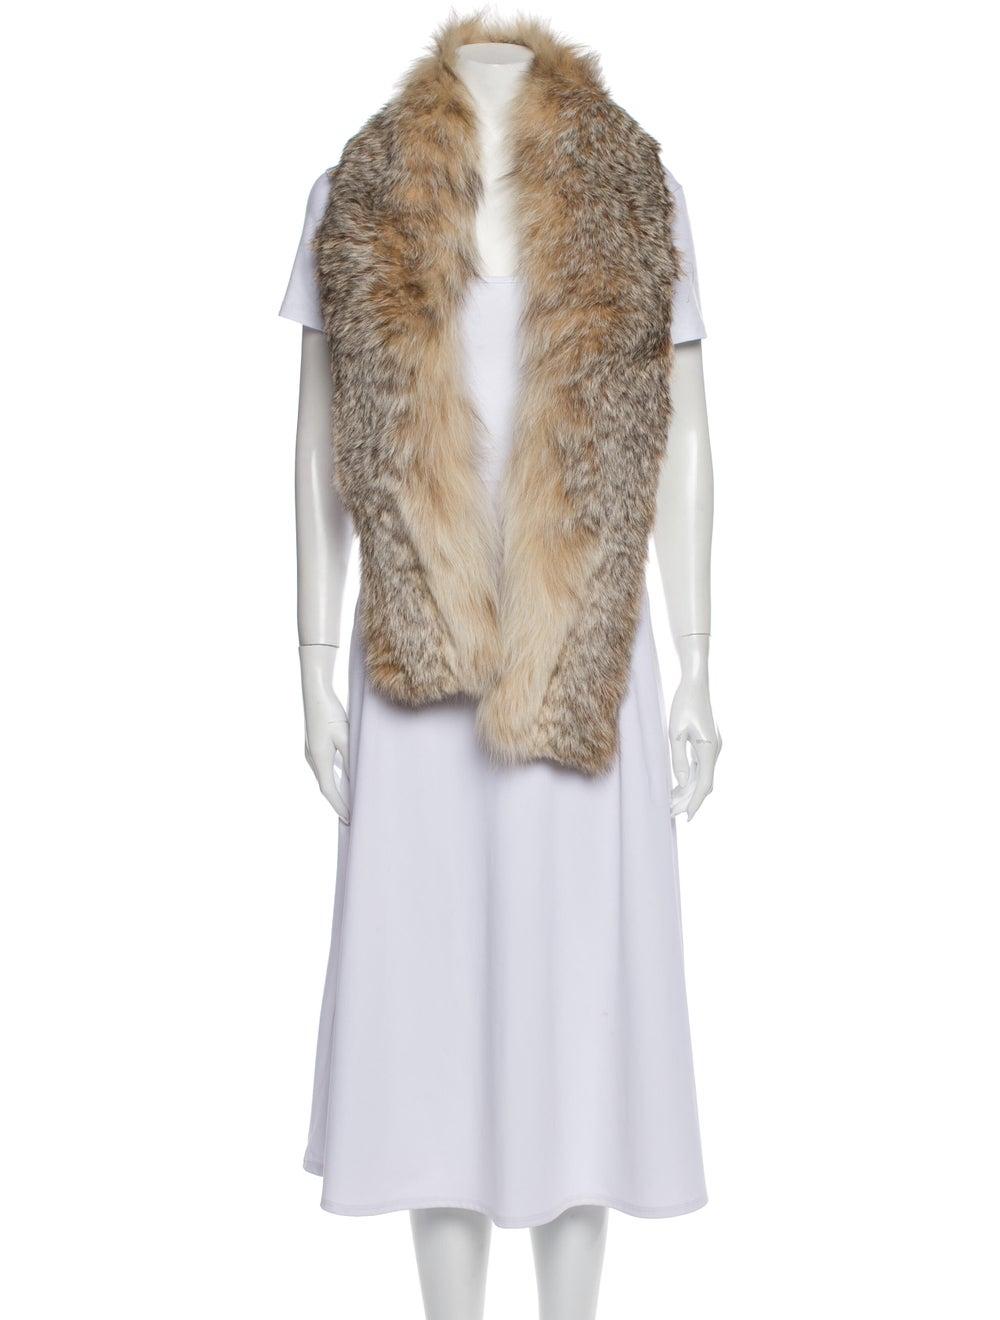 Fur Coyote Stole - image 3